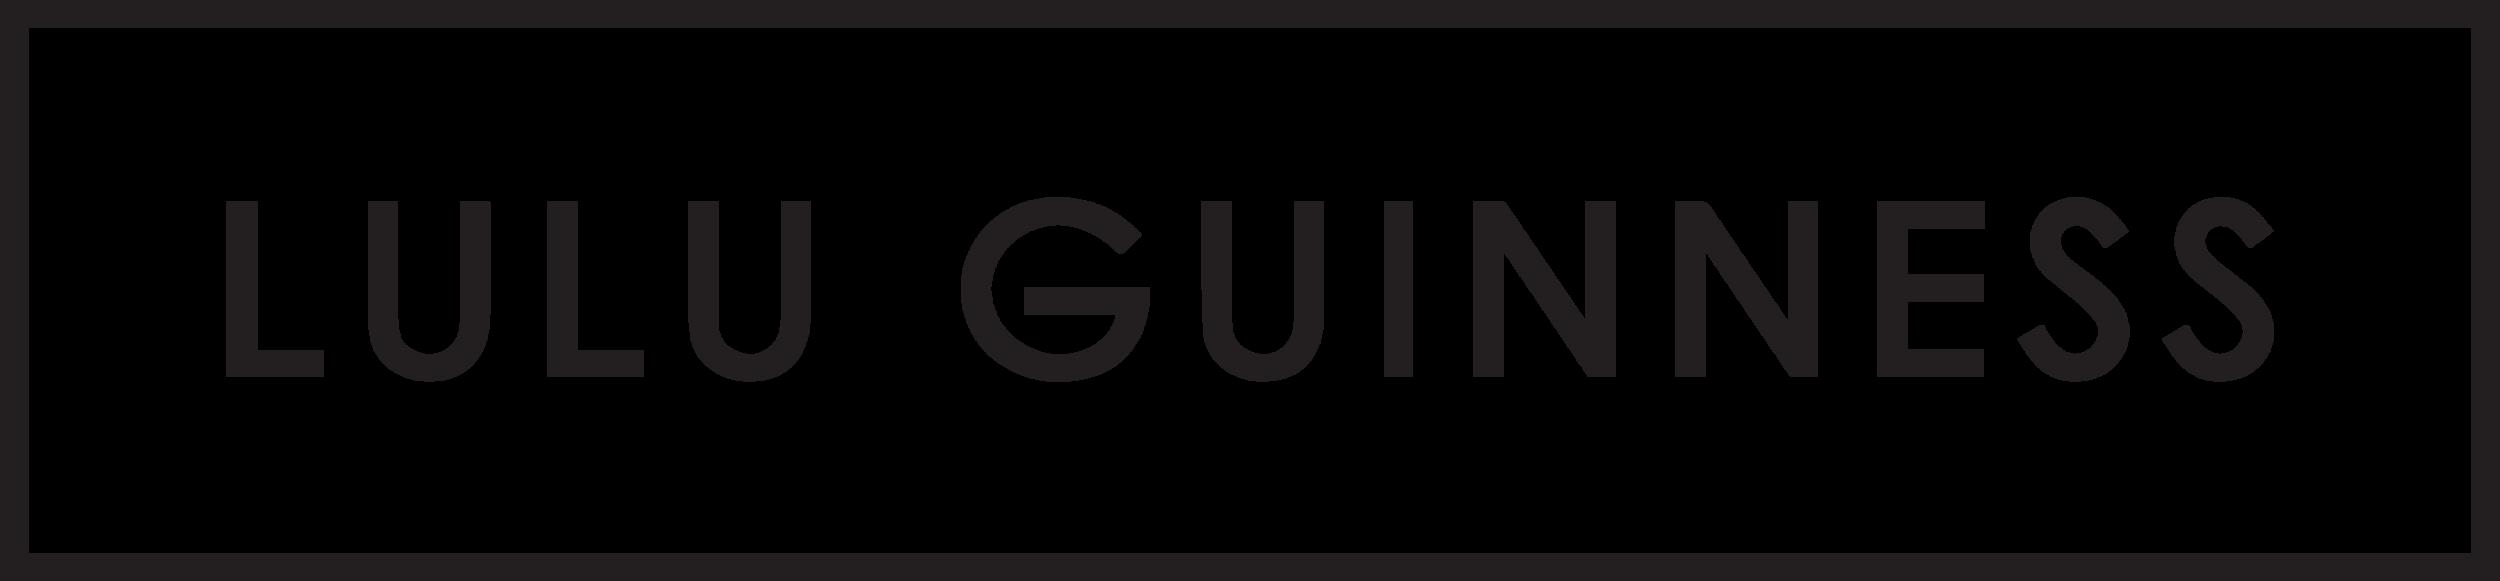 LuluGuinness_Logo.png